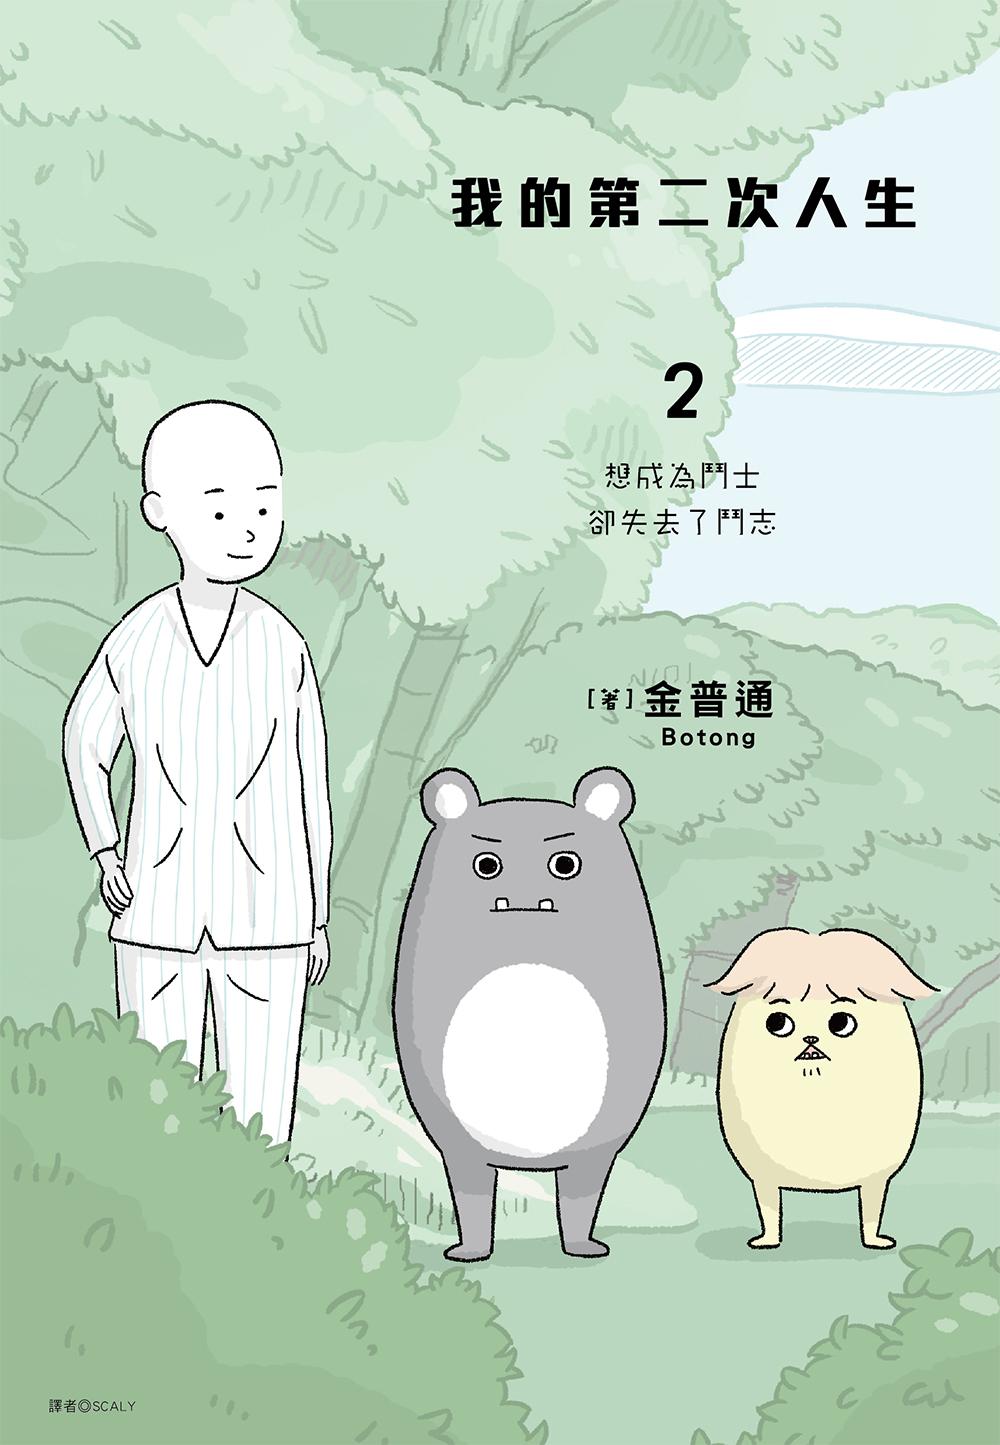 Topics tagged under 尖端 on 紀由屋分享坊 Iayyuy11